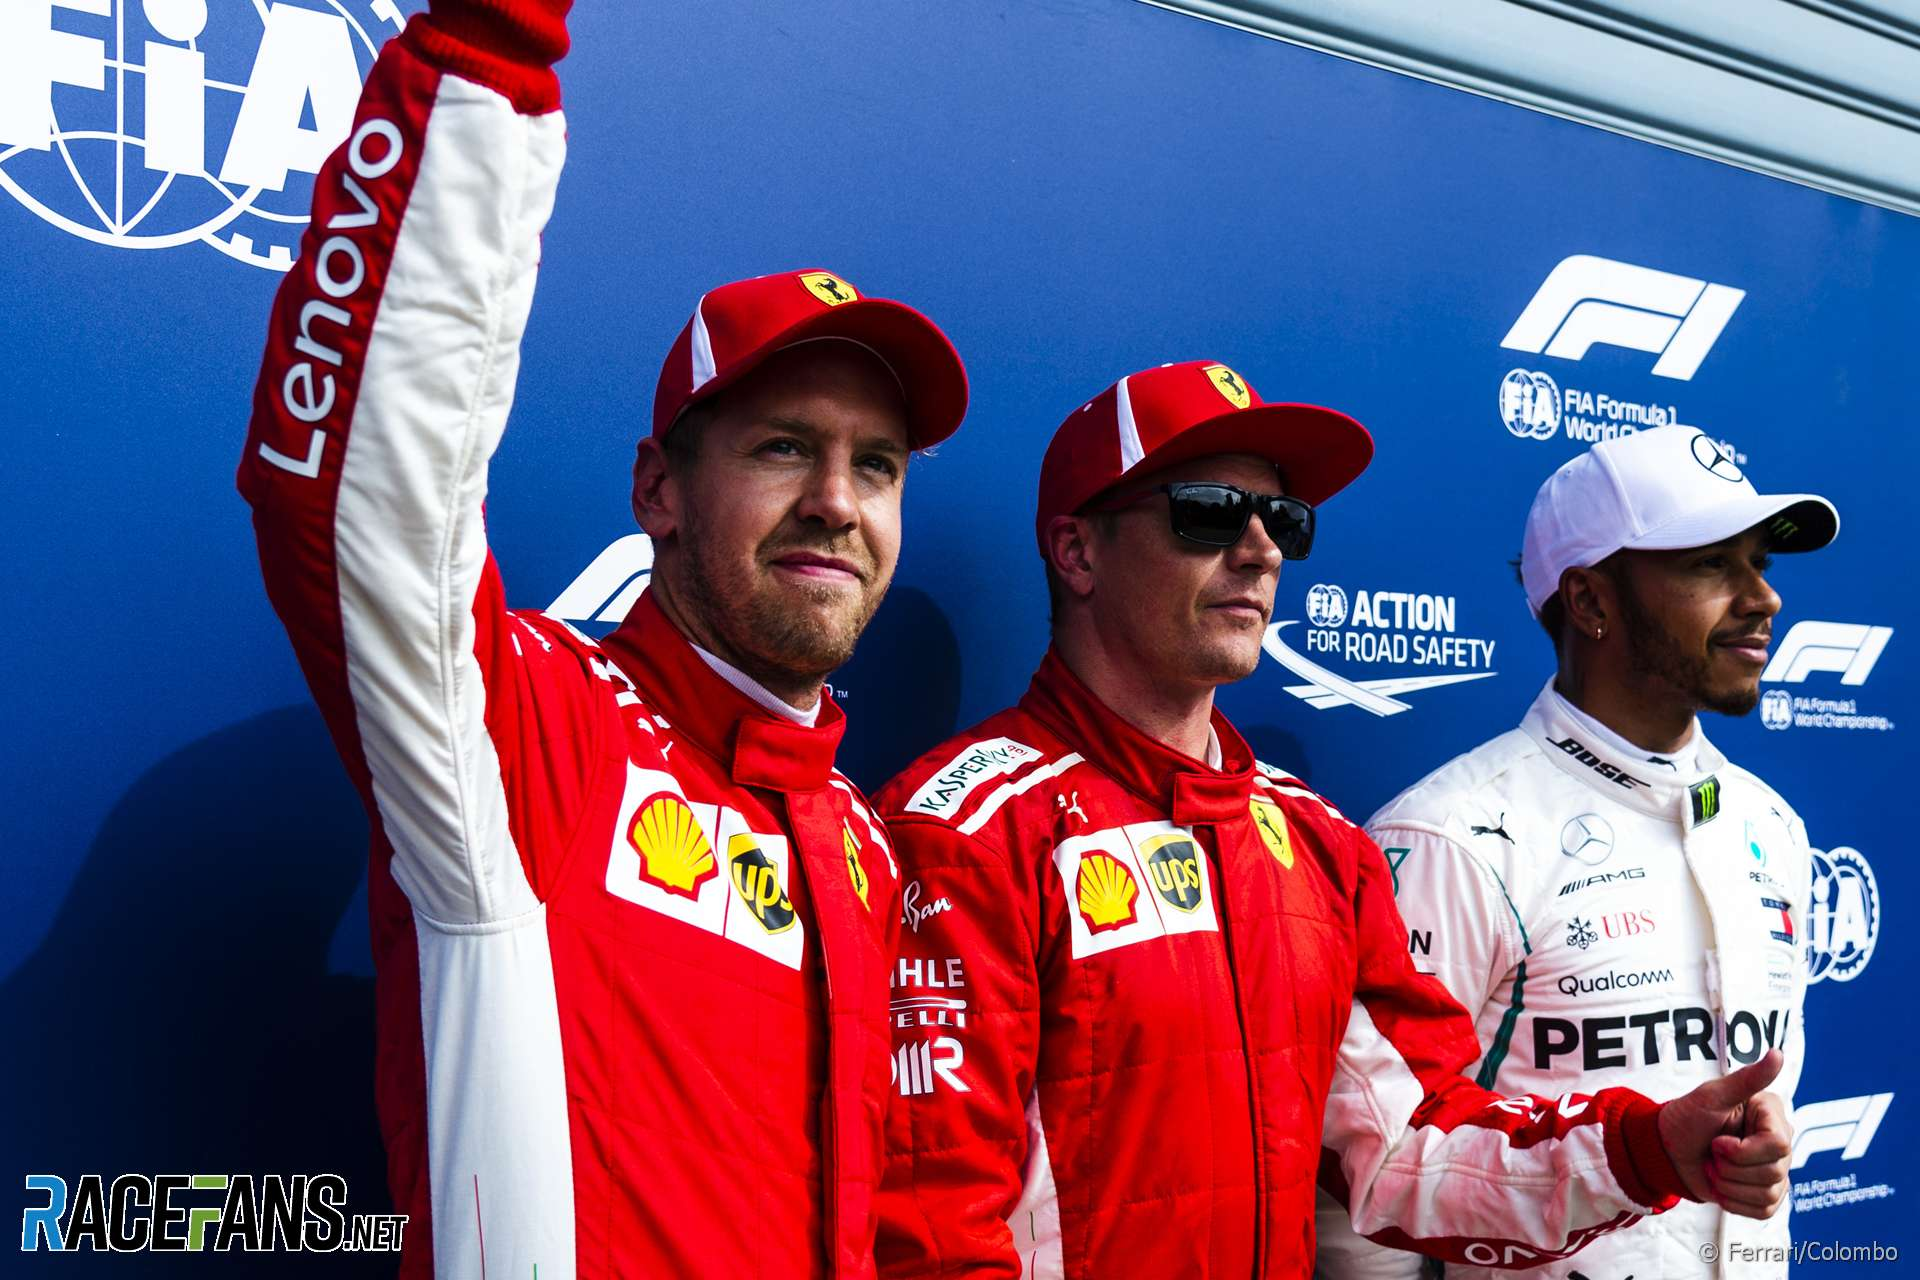 Sebastian Vettel, Kimi Raikkonen, Lewis Hamilton, Monza, 2018